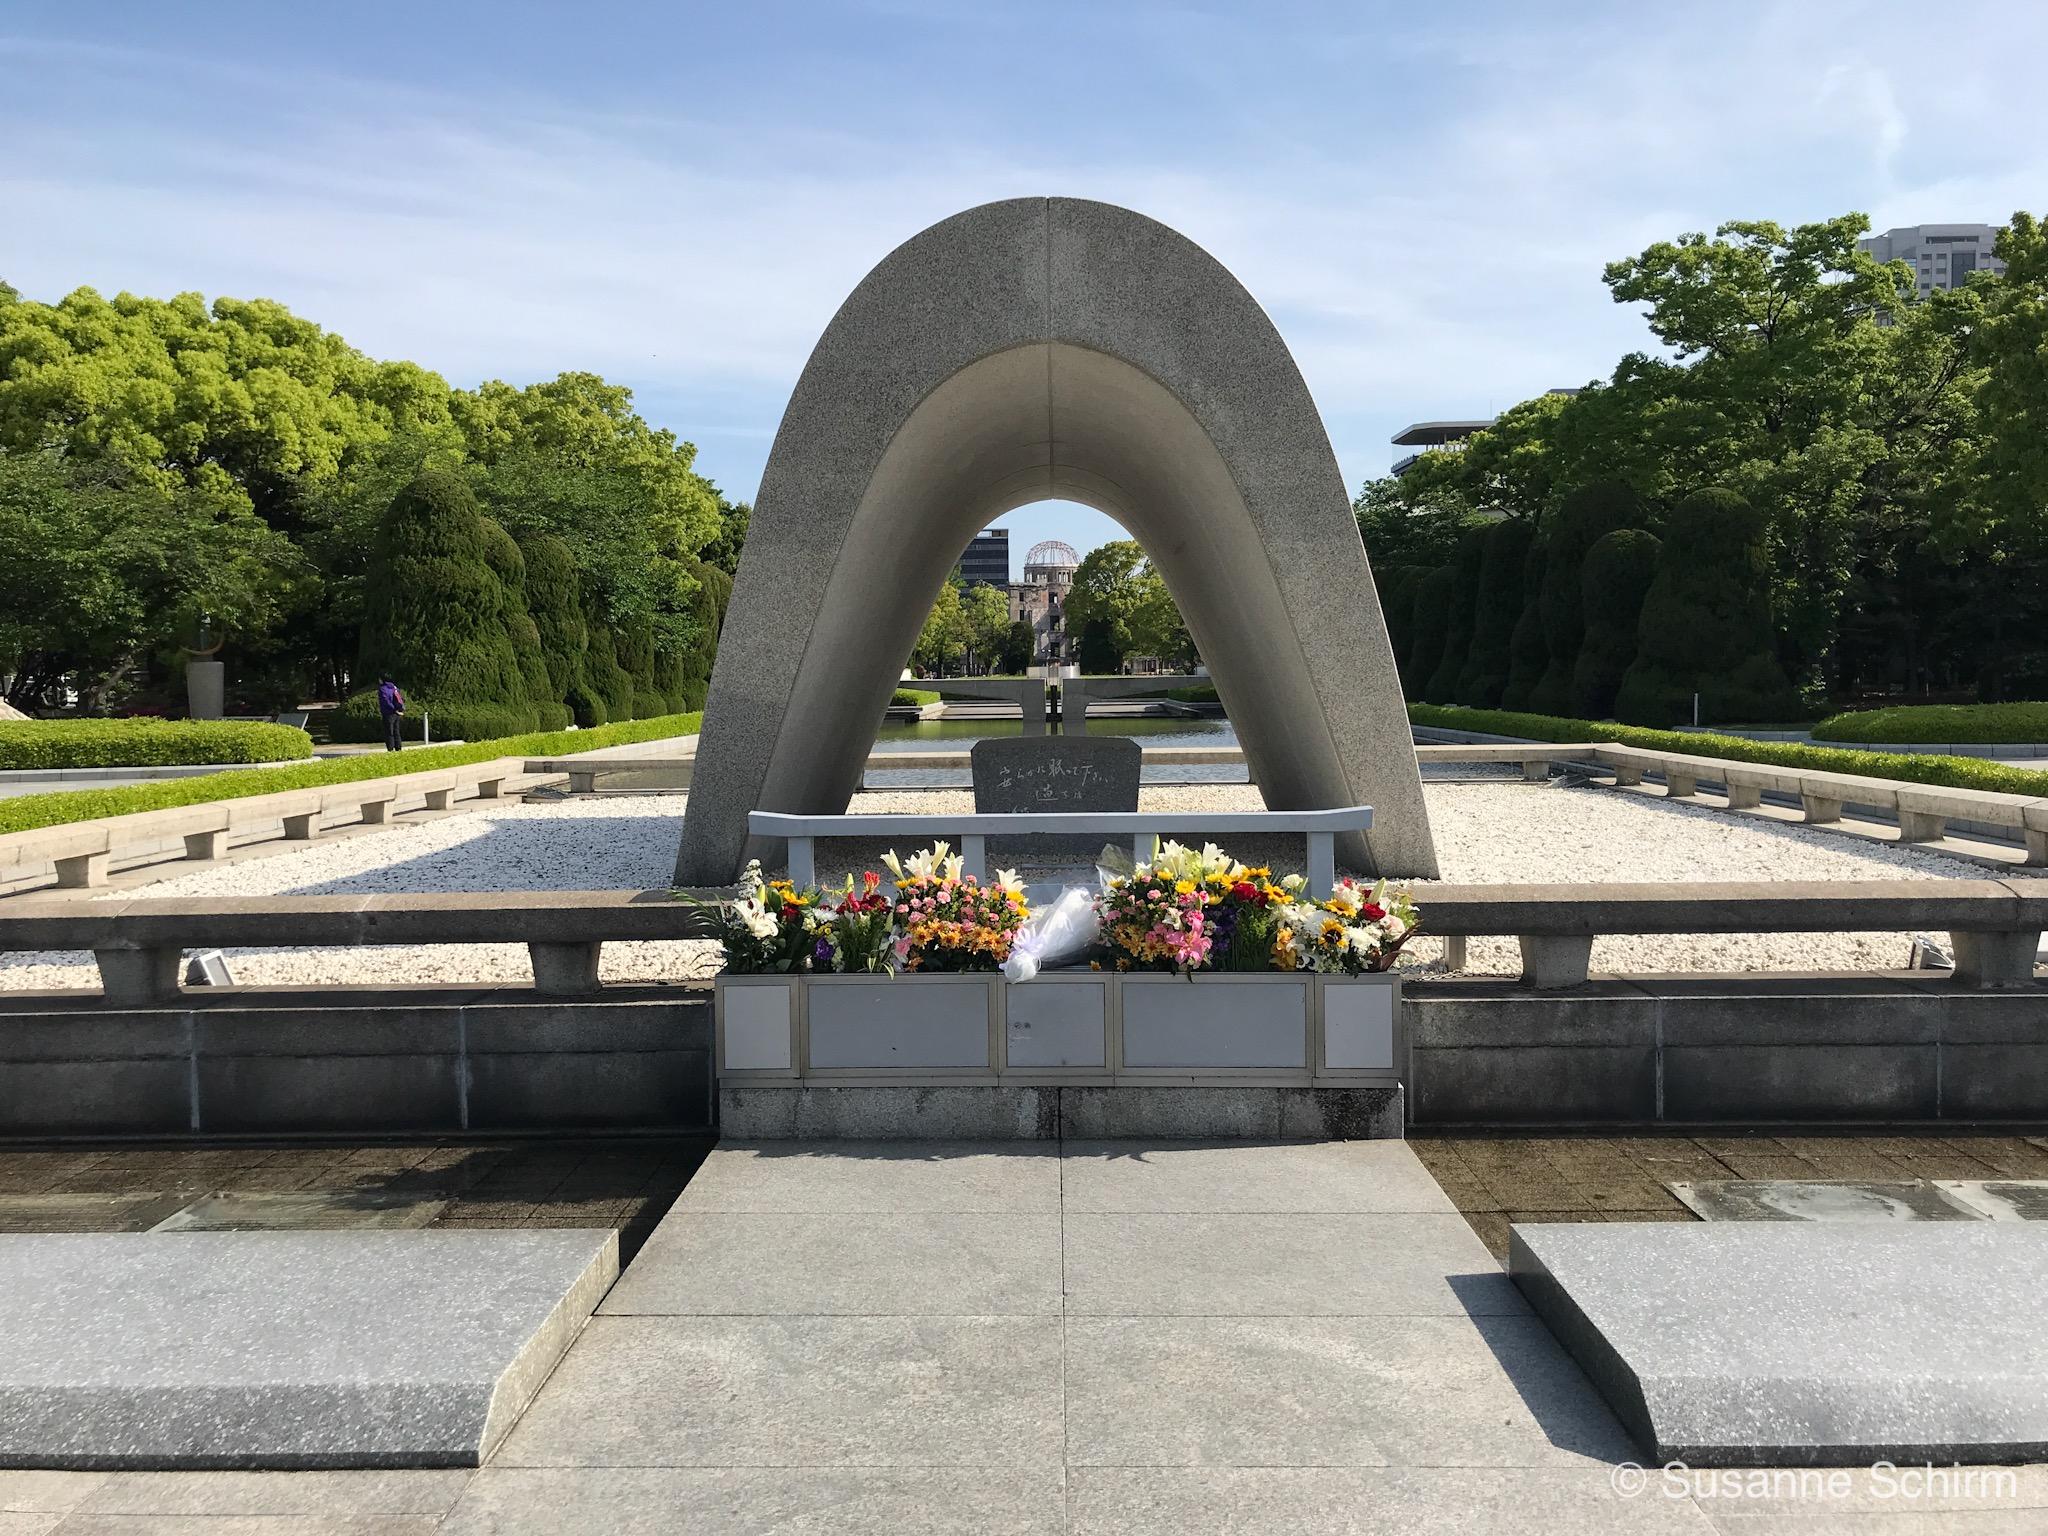 Bild vom Kenotaph in Hiroshima